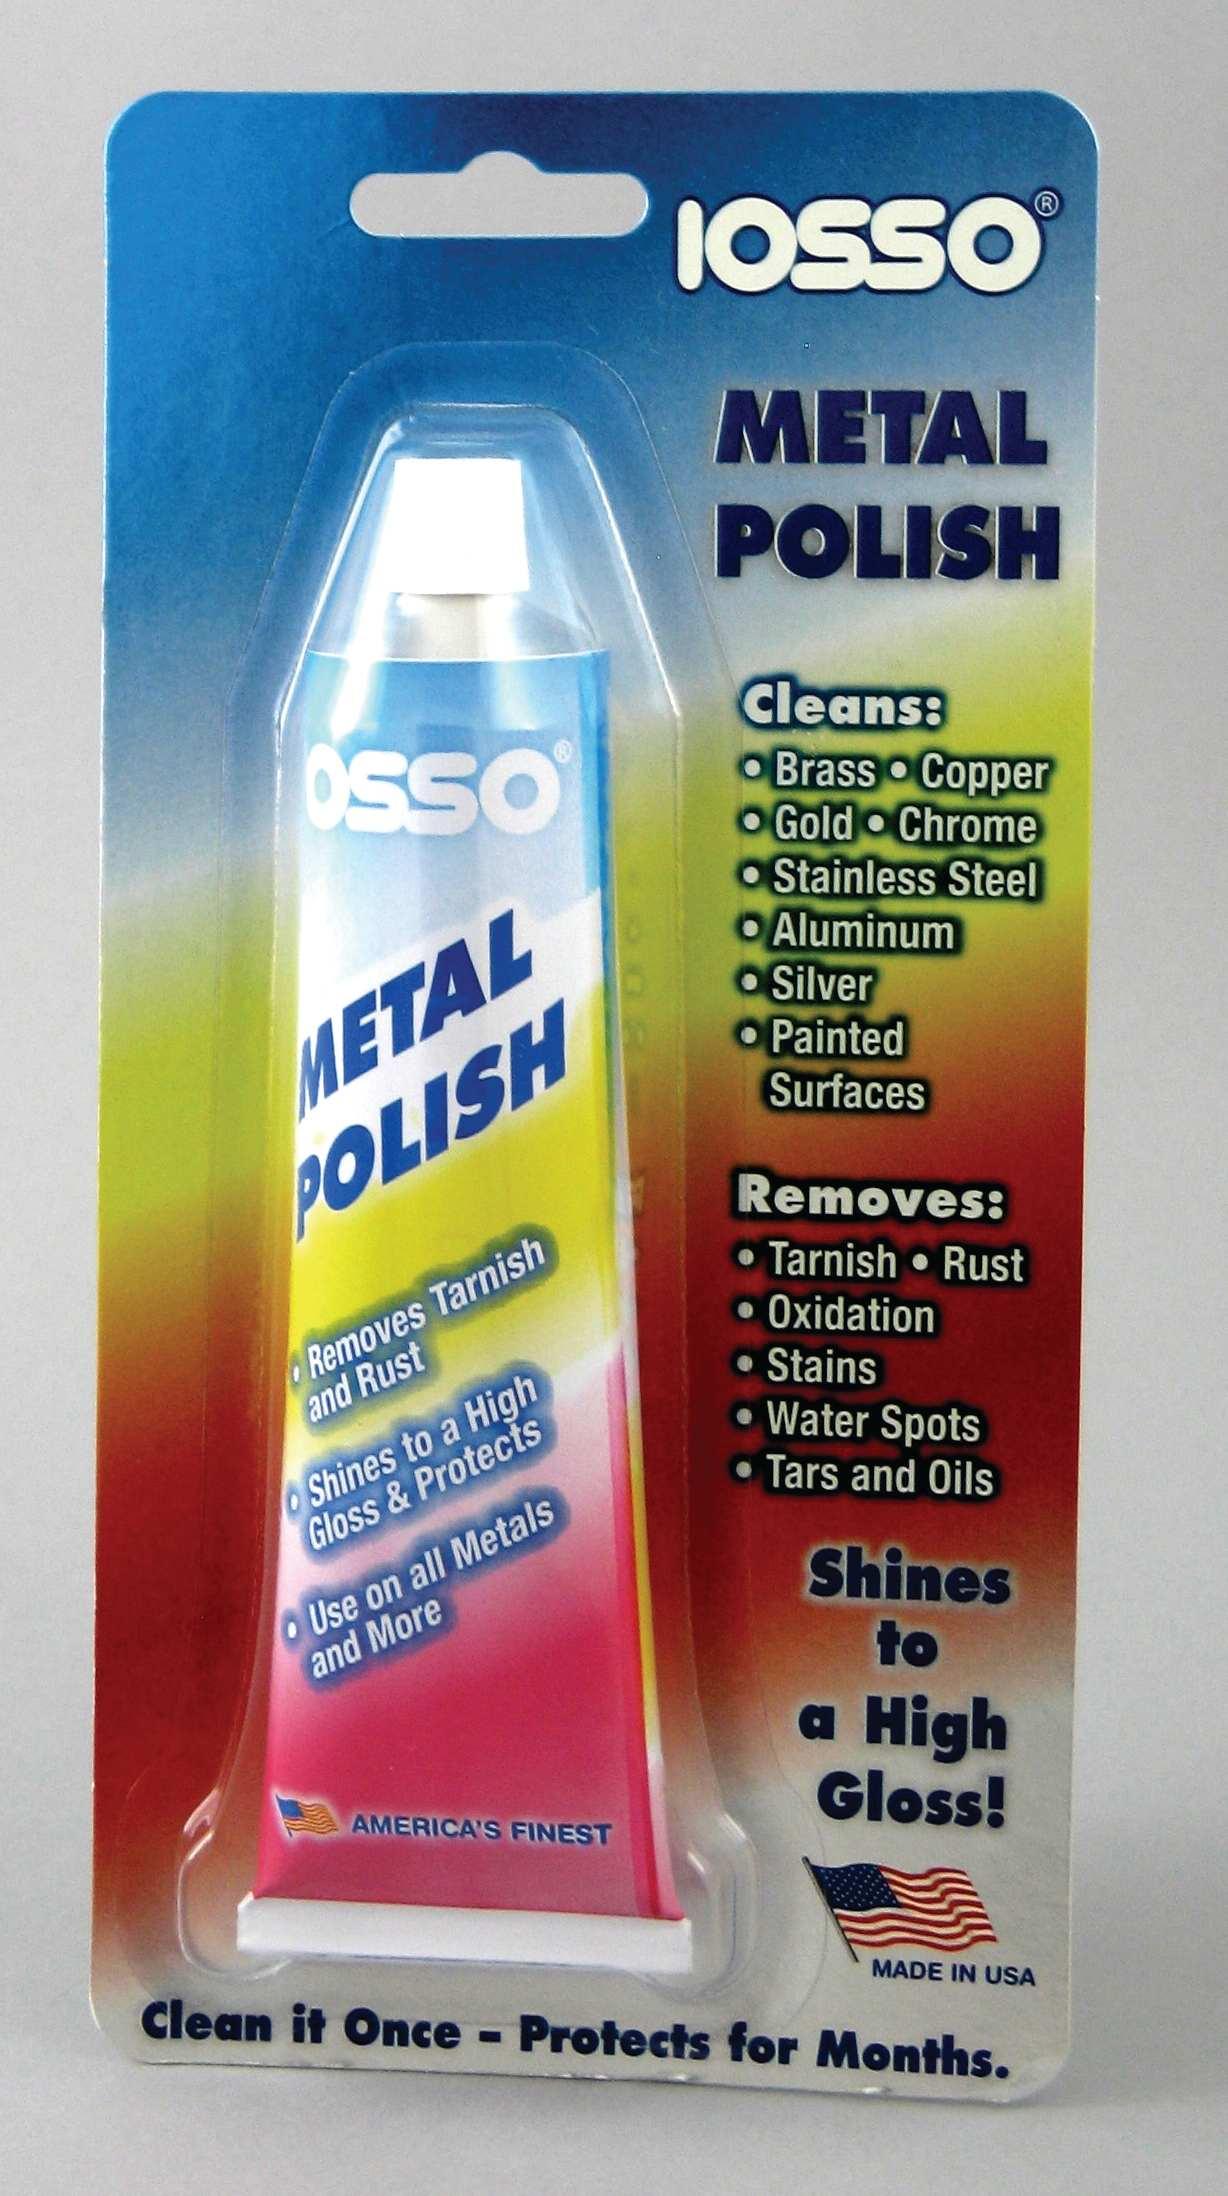 Iosso Metal Polish